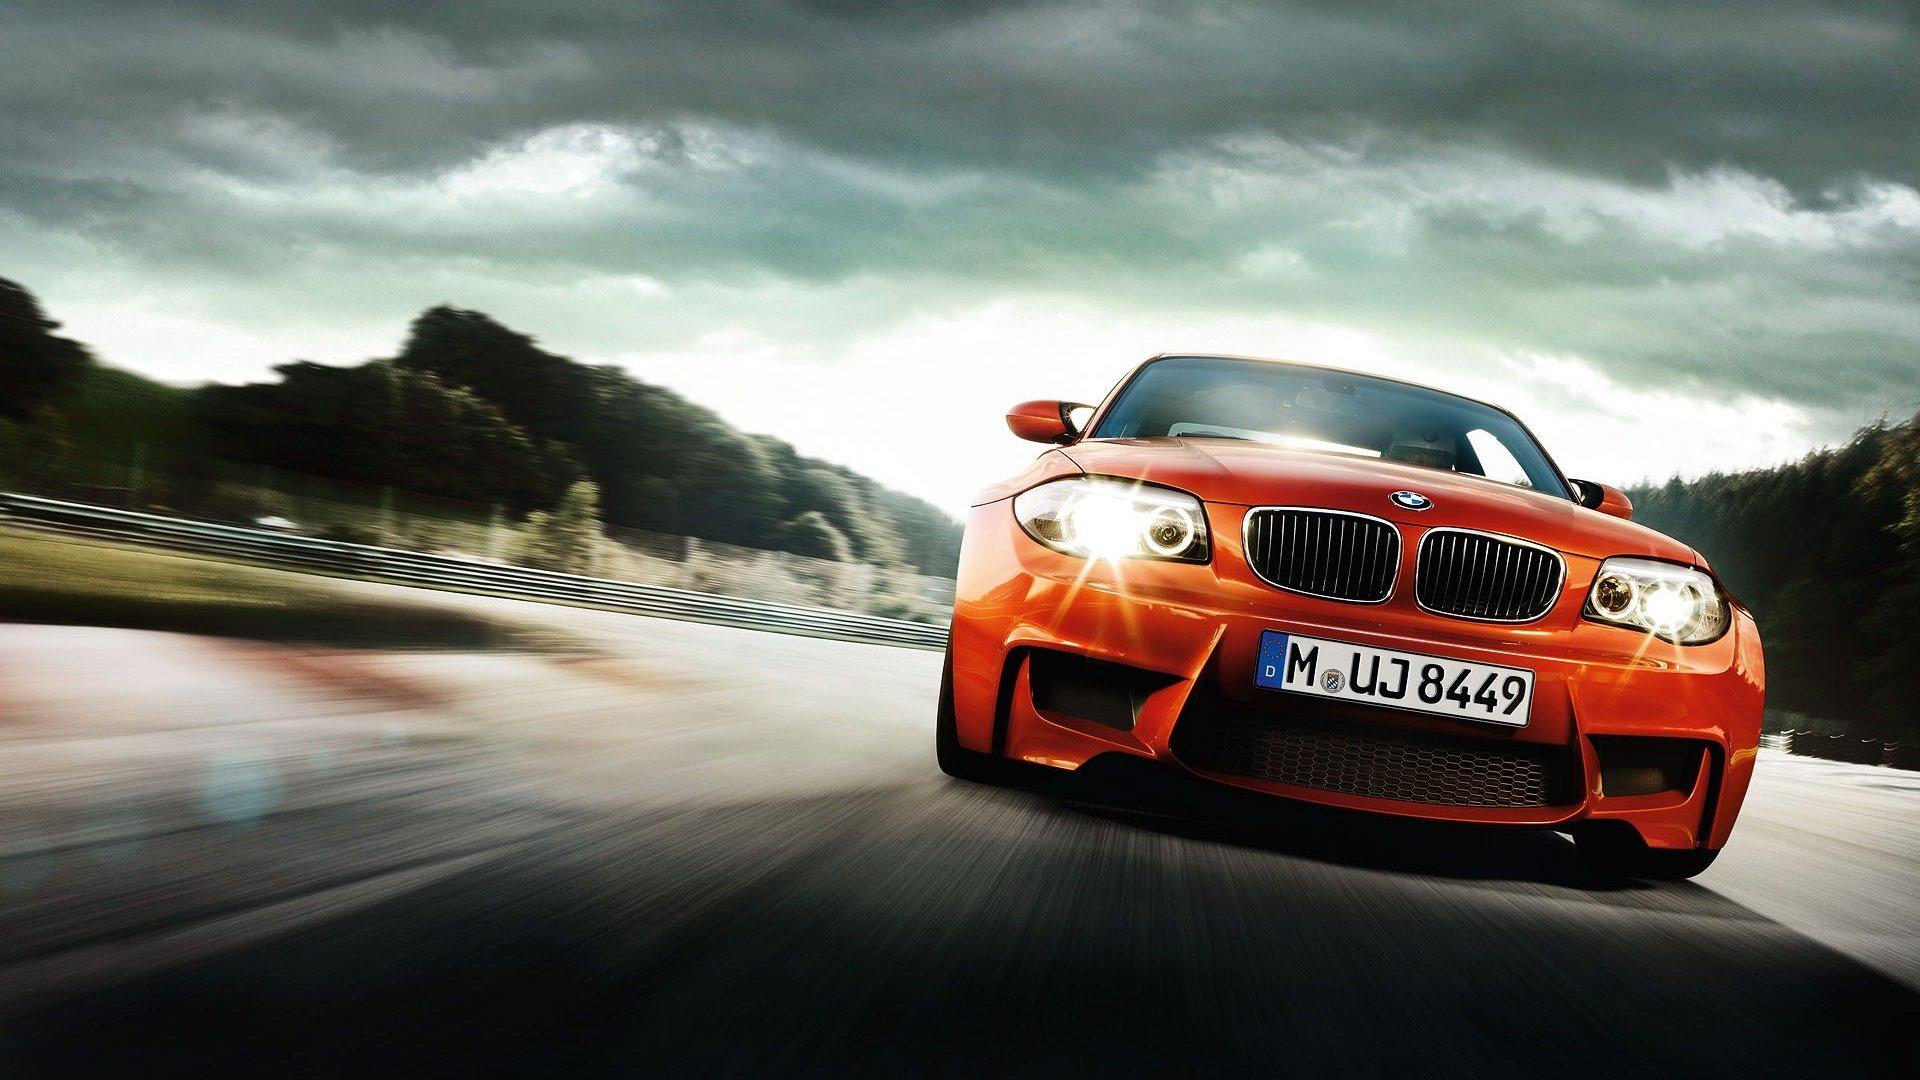 49 Speedy Car Wallpapers For Desktop Download 1920x1080